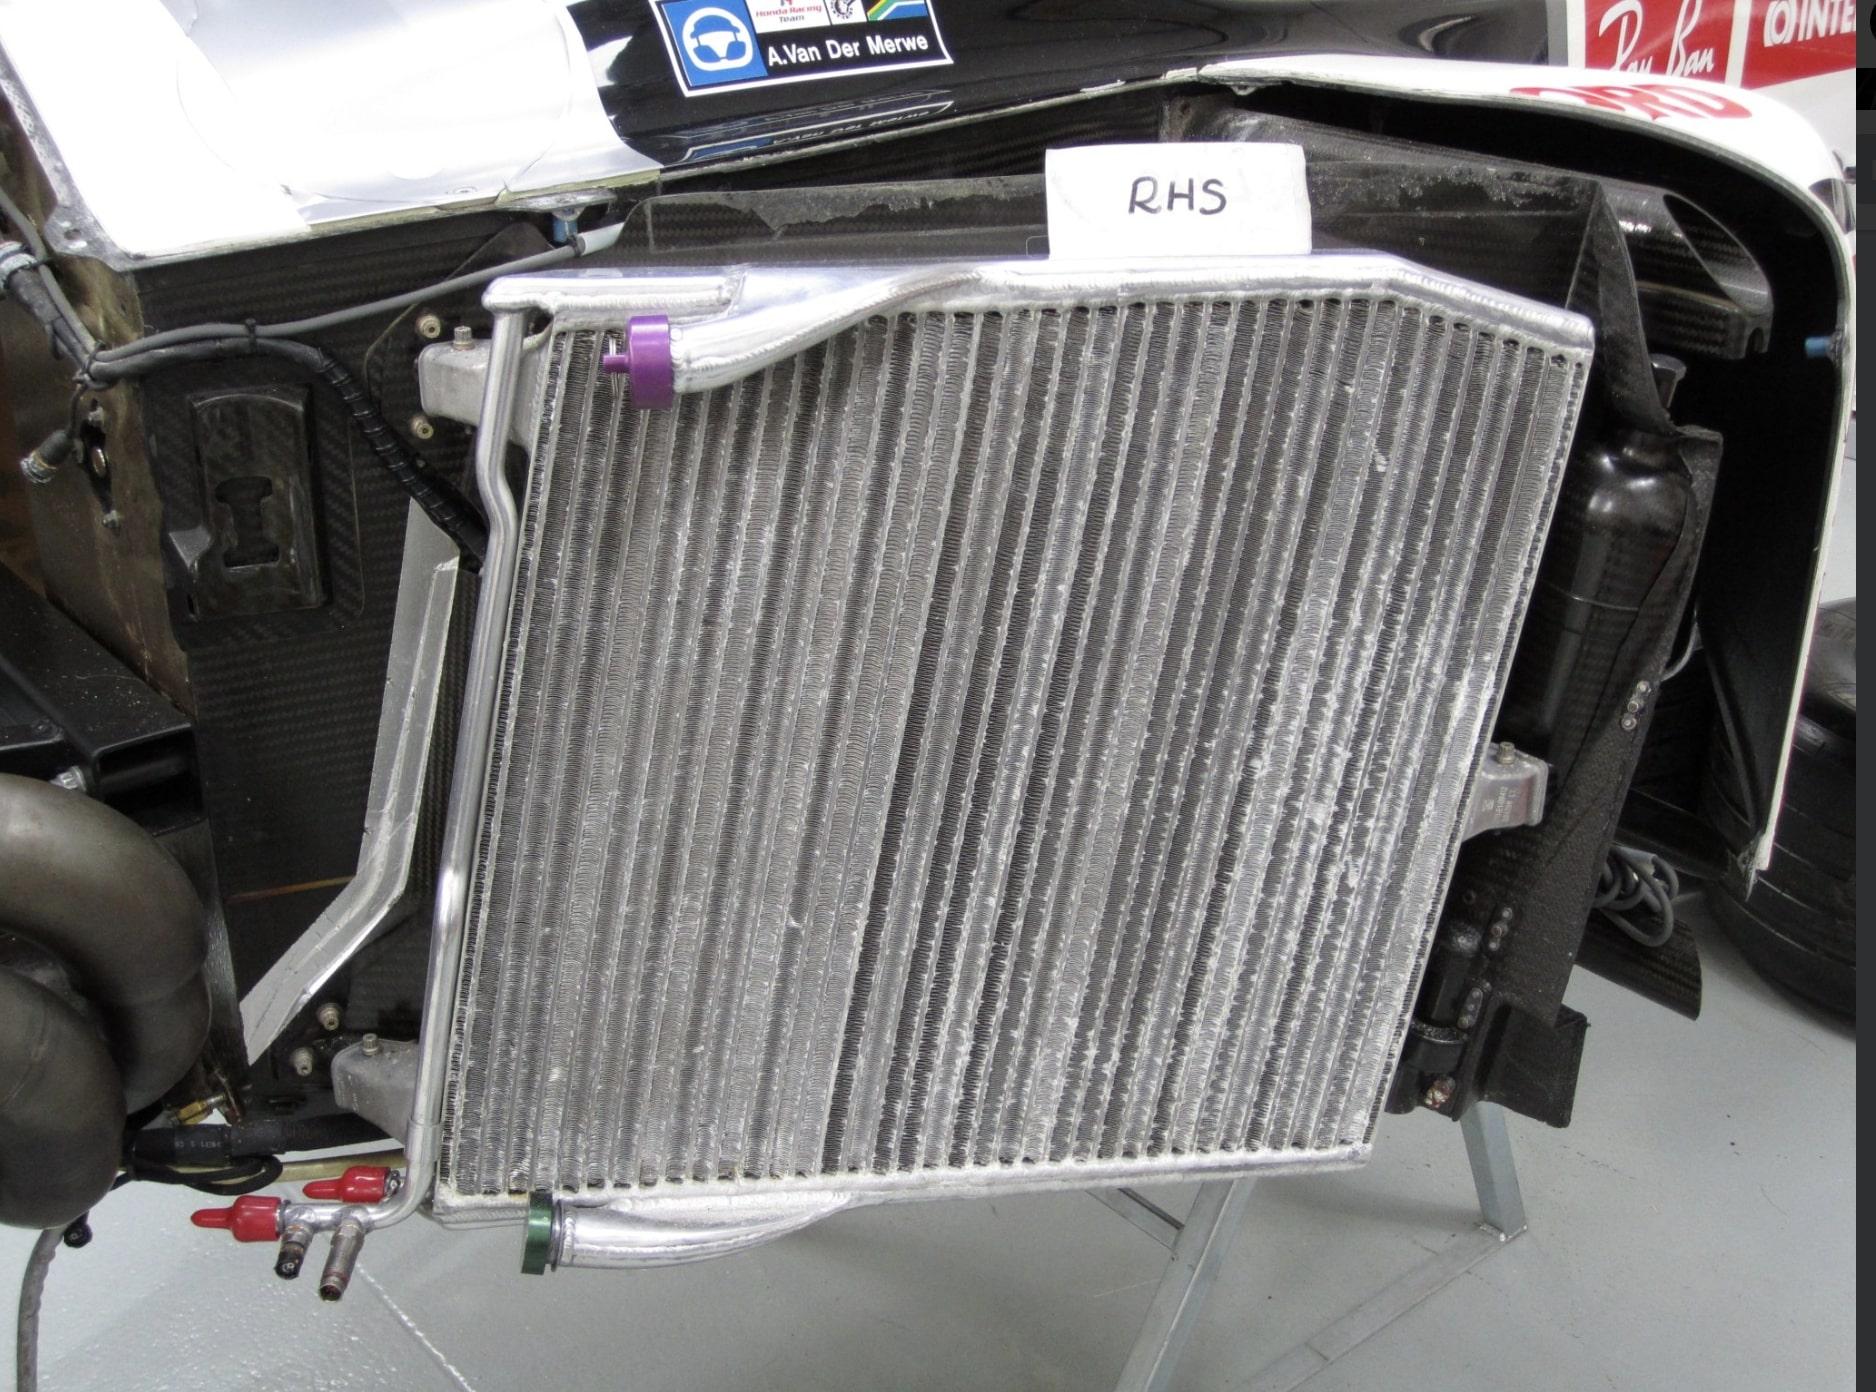 BAR-Honda Bonneville (17)